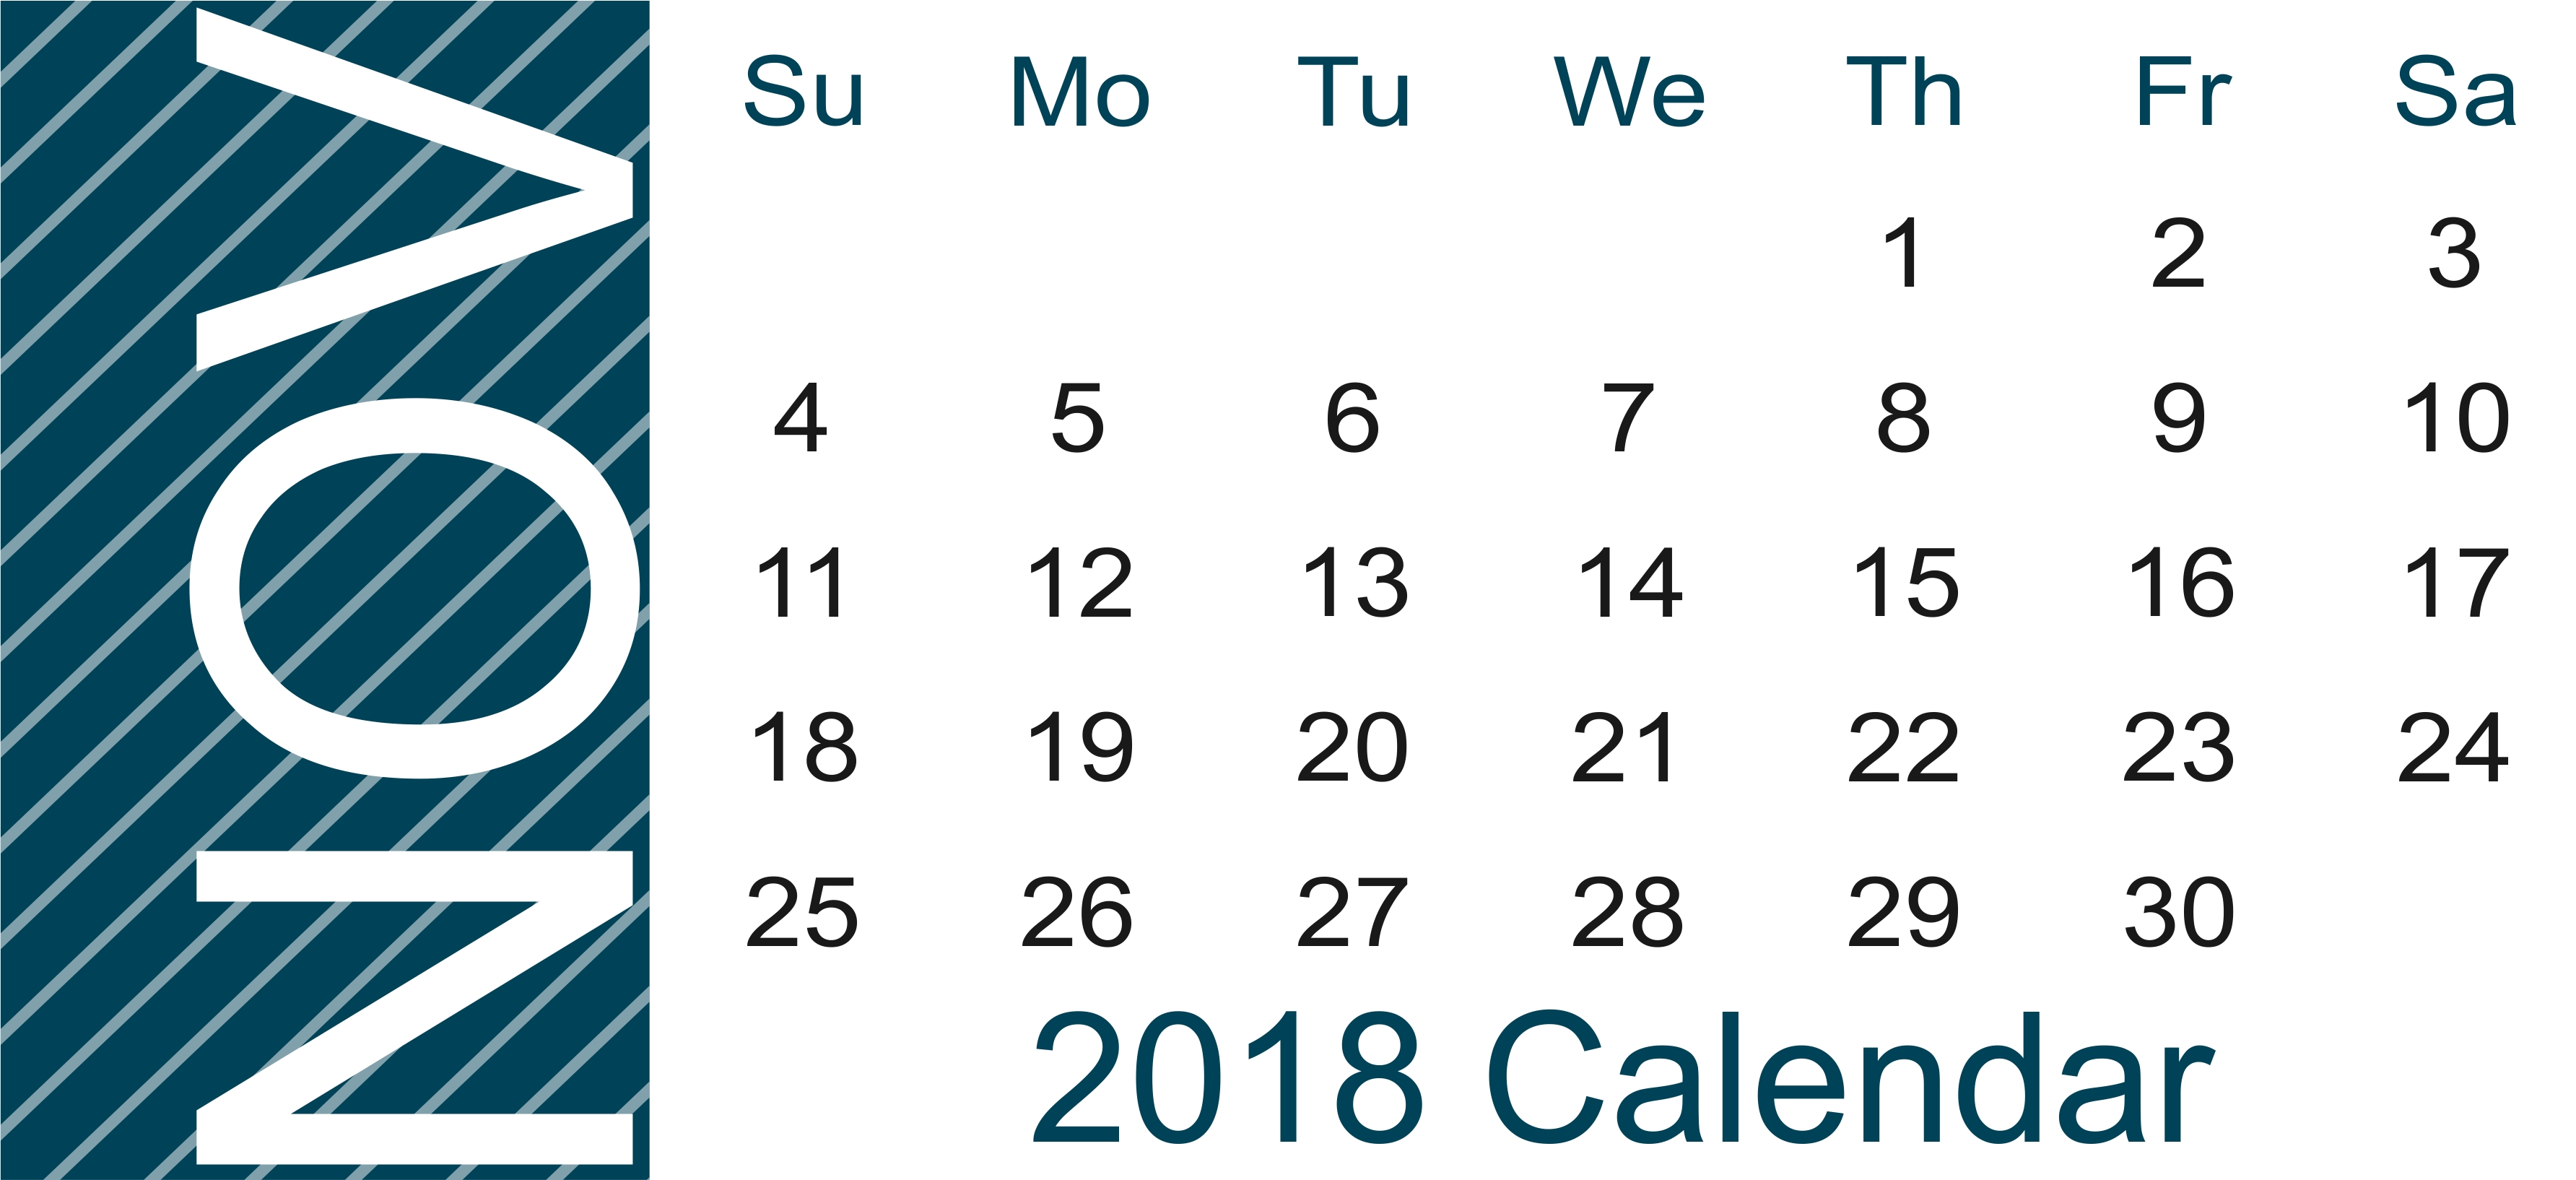 november 2018 landscape portrait calendar template download::November 2018 Calendar Template